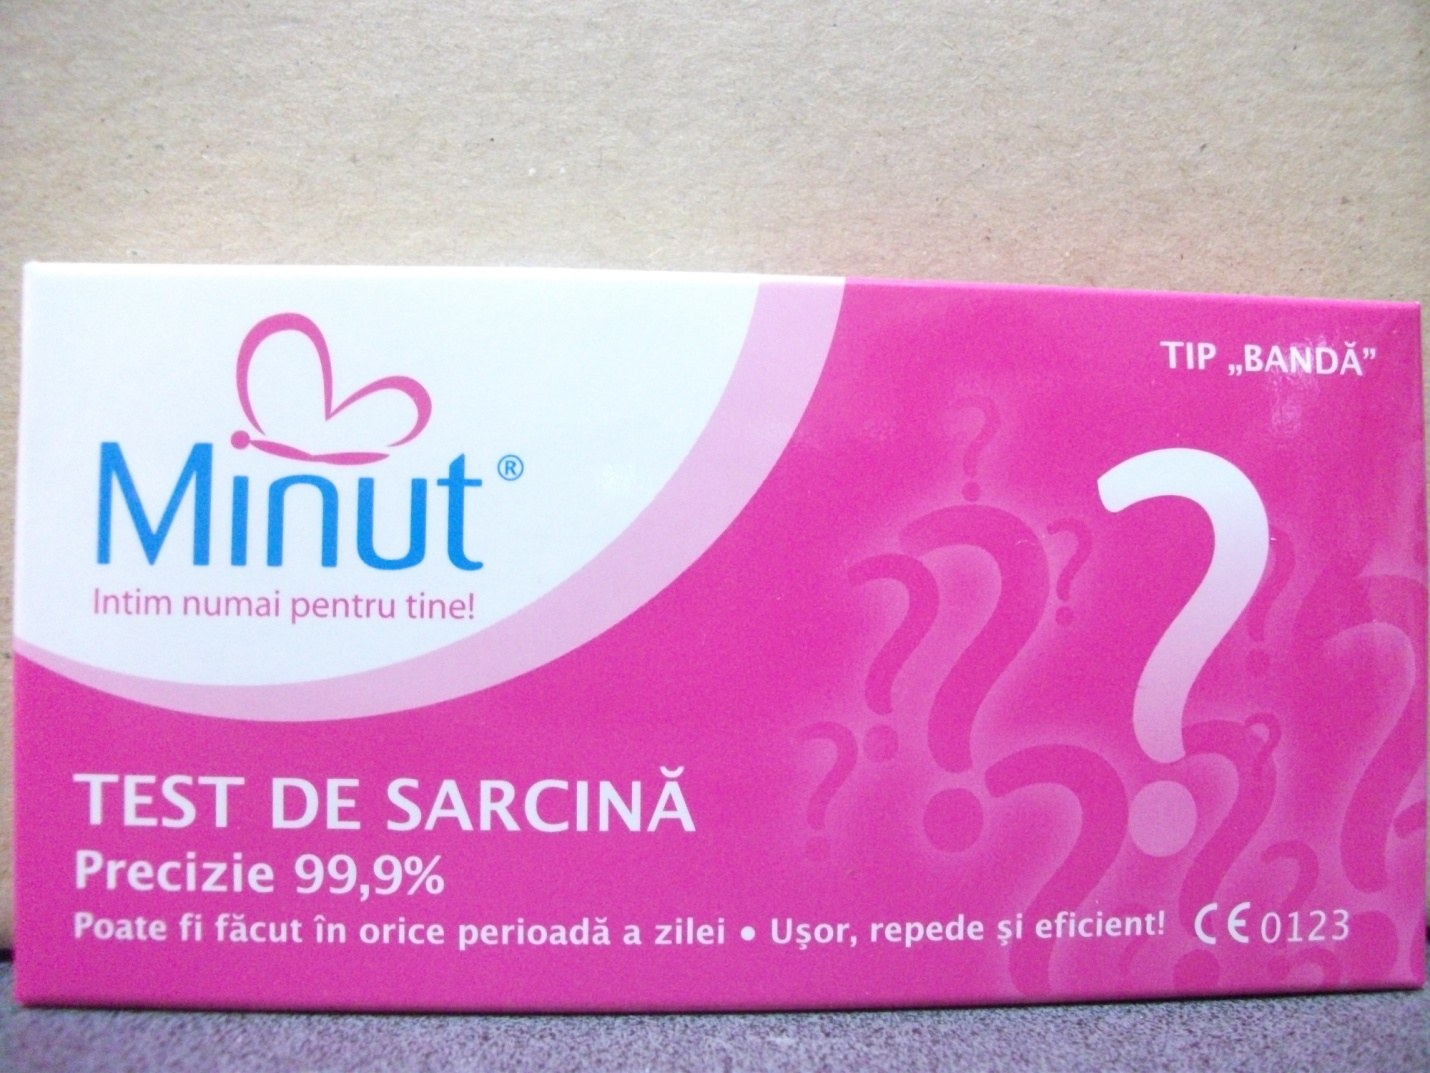 Test de sarcina MINUT tip Banda